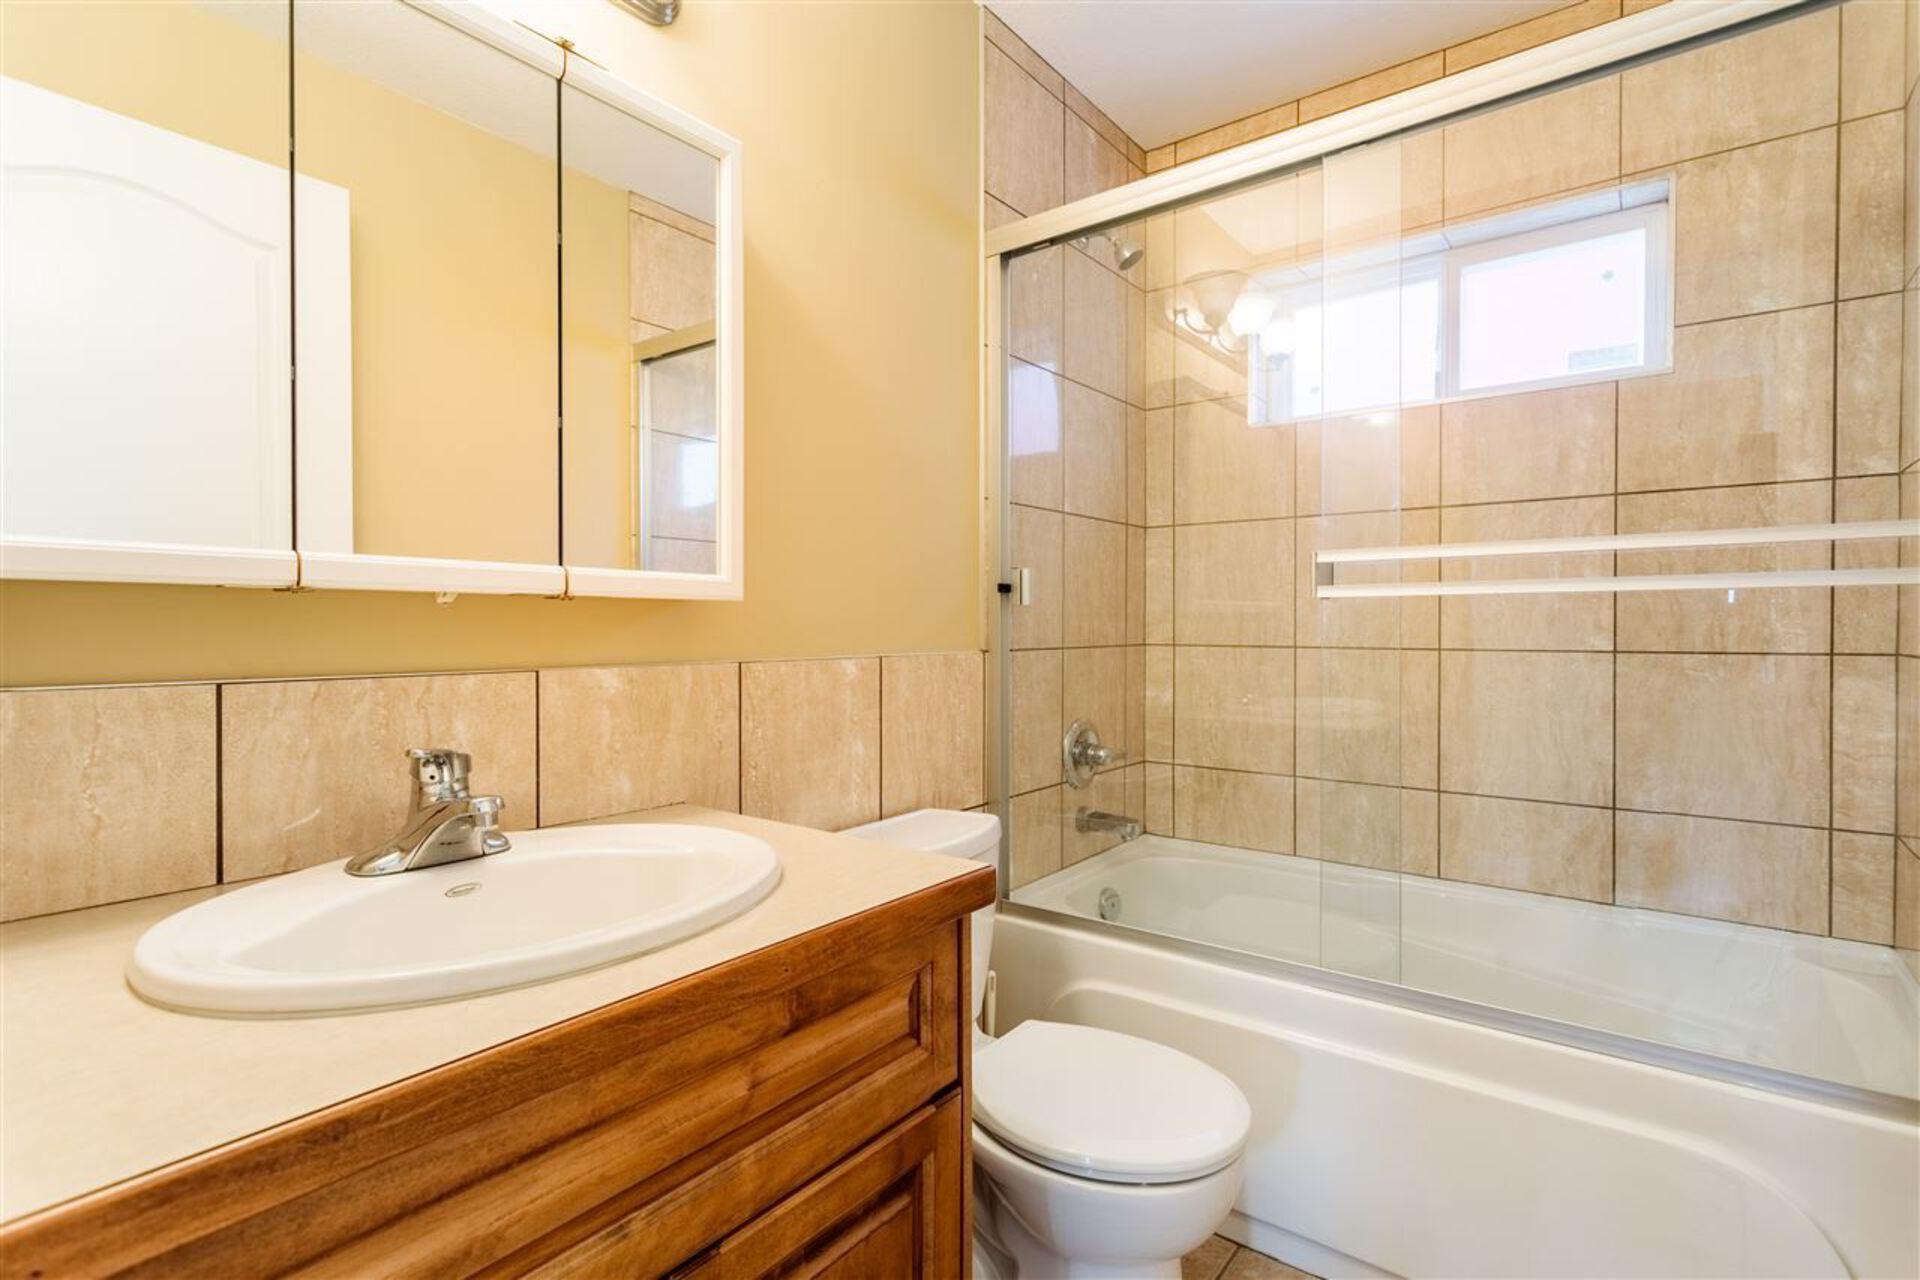 4015-frances-street-willingdon-heights-burnaby-north-16 at 4015 Frances Street, Willingdon Heights, Burnaby North